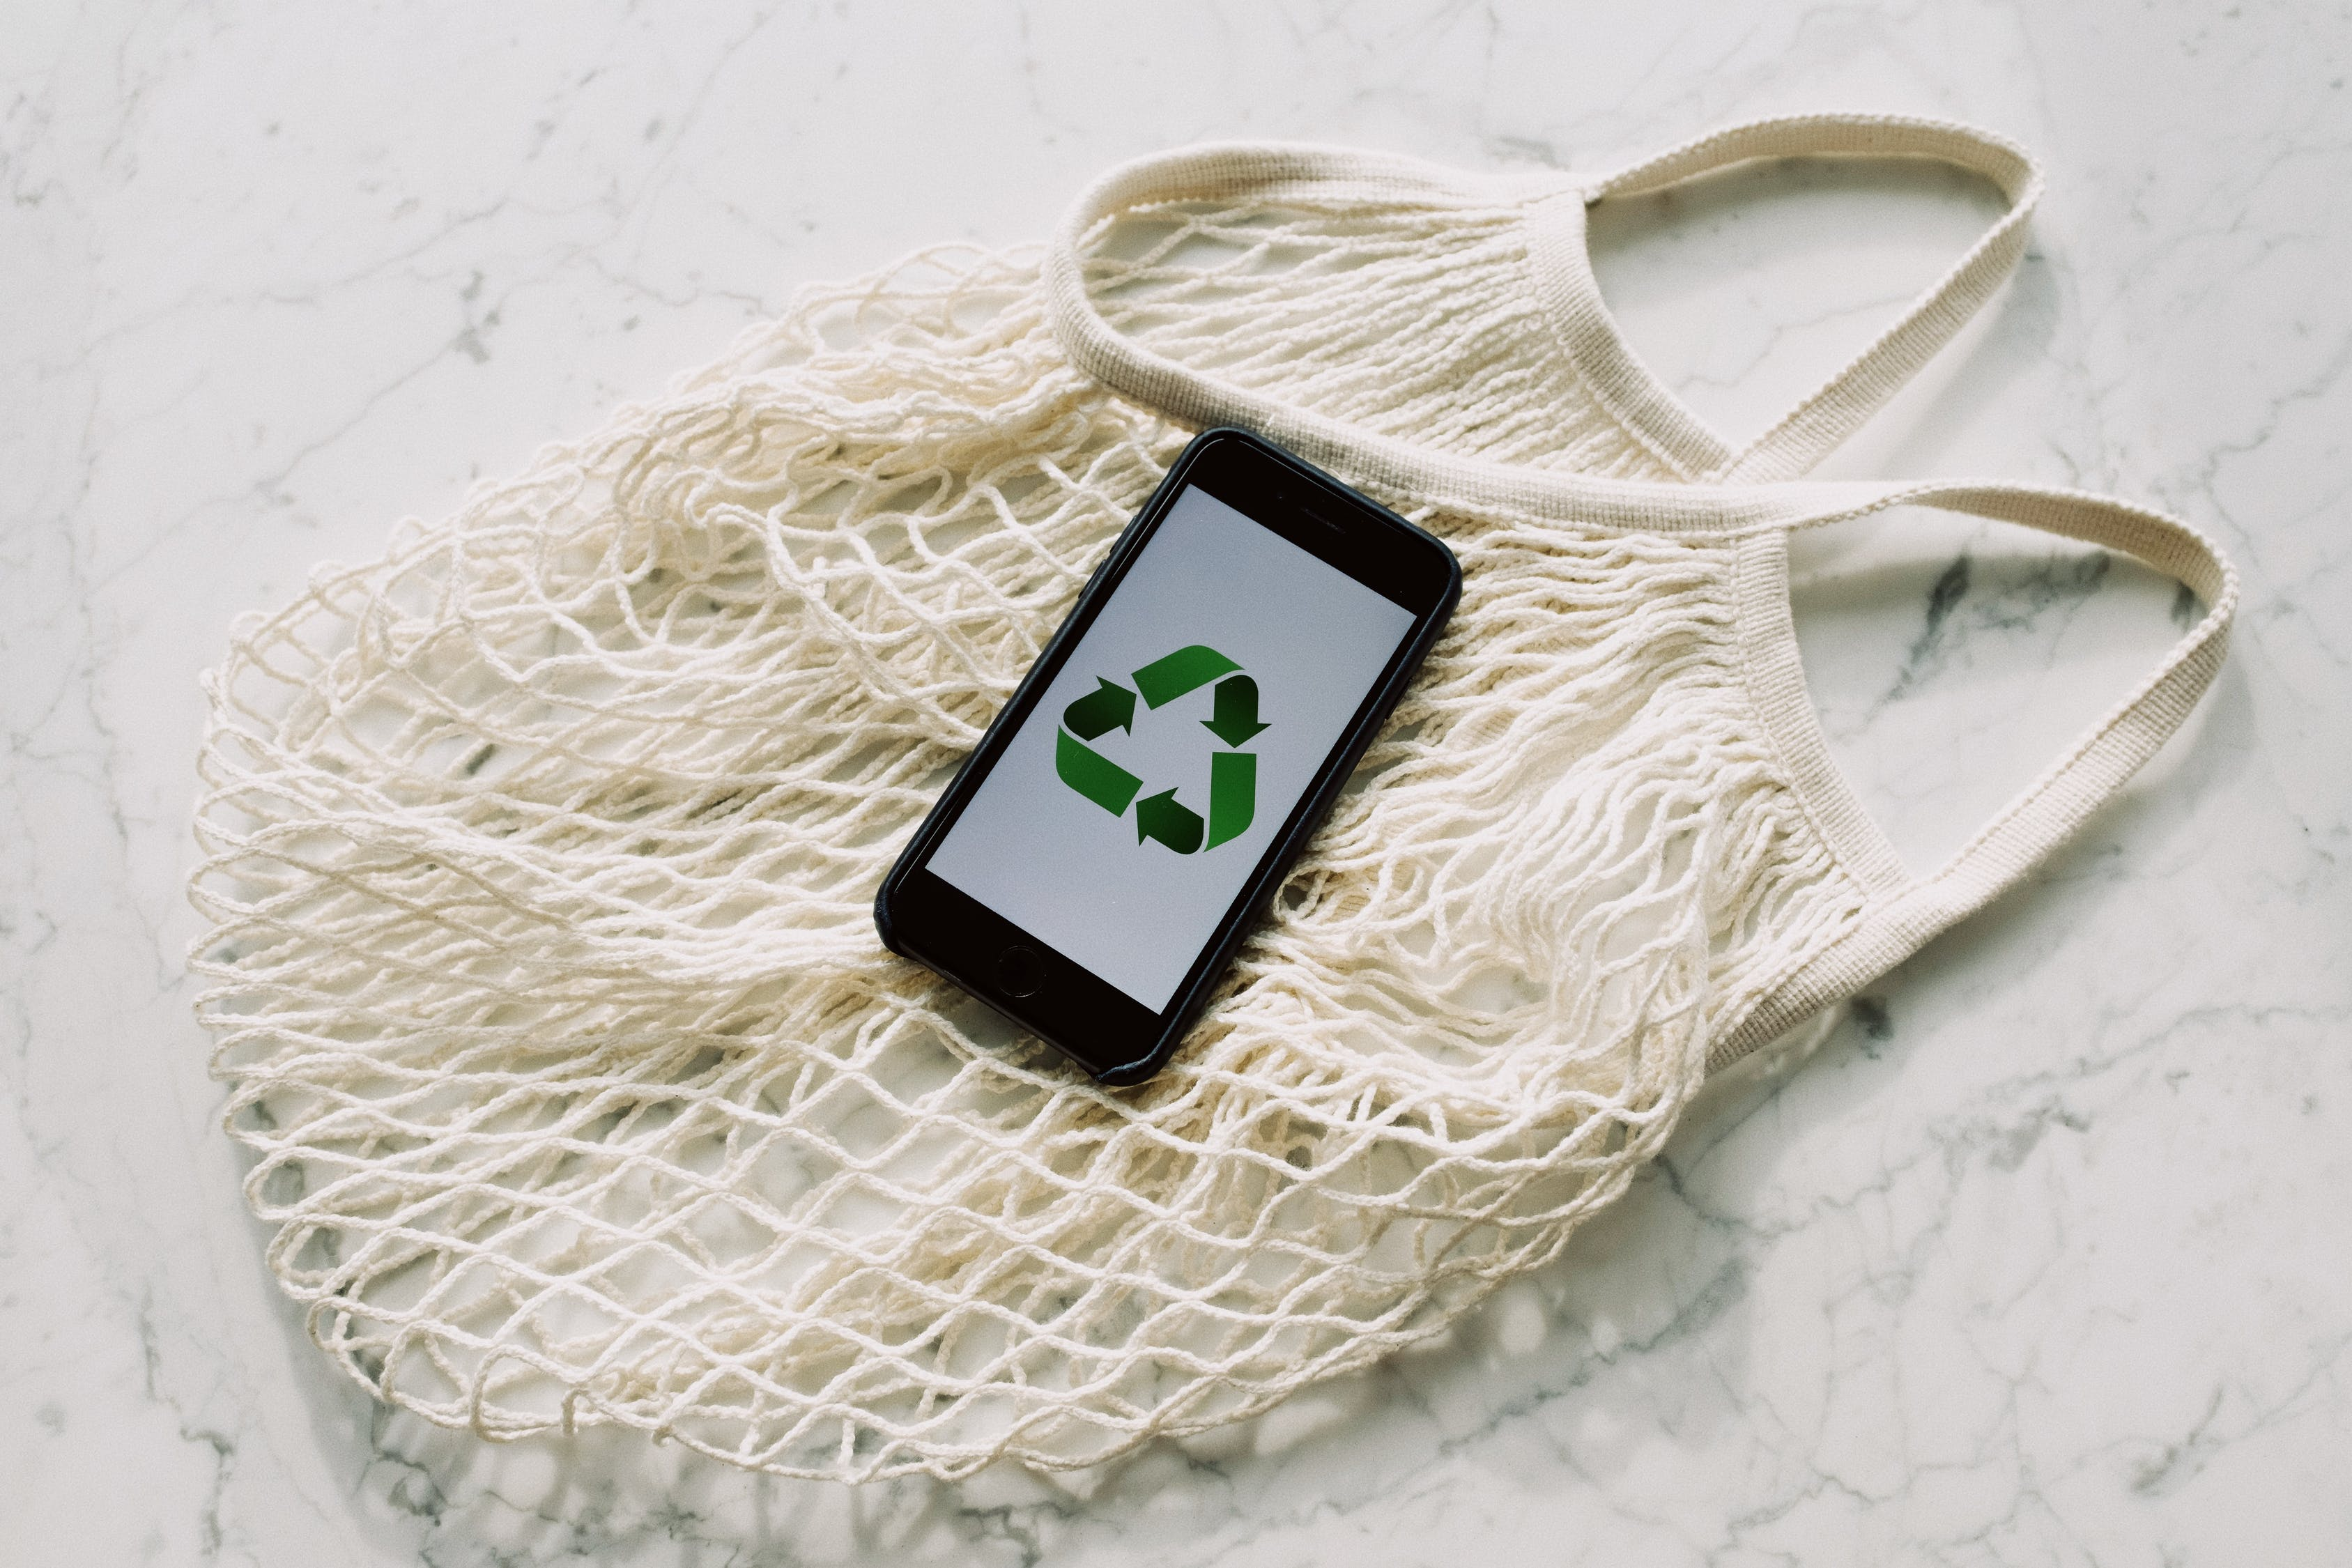 teknologi daur ulang